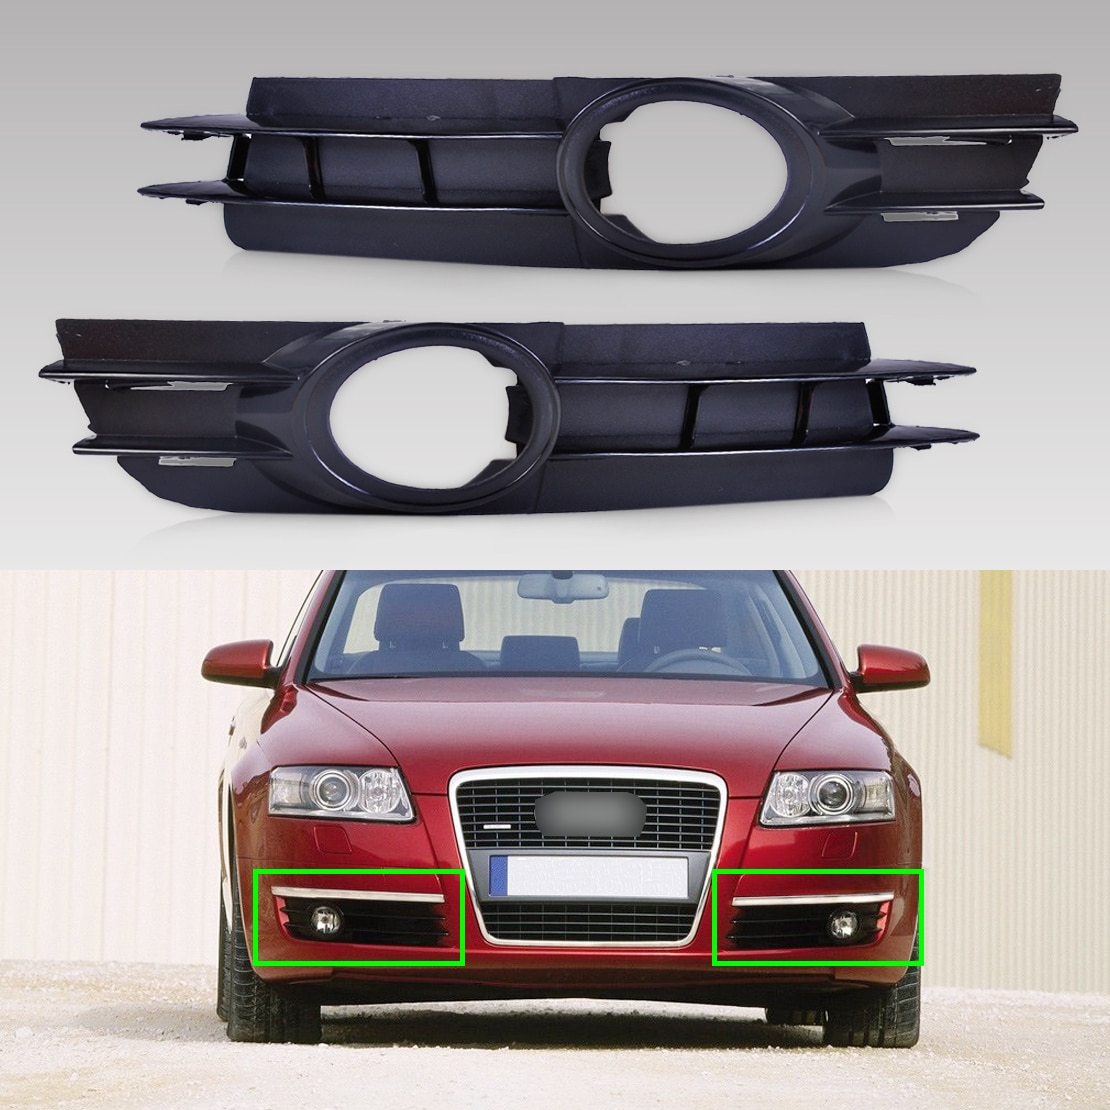 DWCX 4F0807681A / 4F0807682A 2PCS Front Left + Right Fog Light Lamp Grill Grille For Audi A6 / A6 Quattro C6 2005 2006 2007 2008